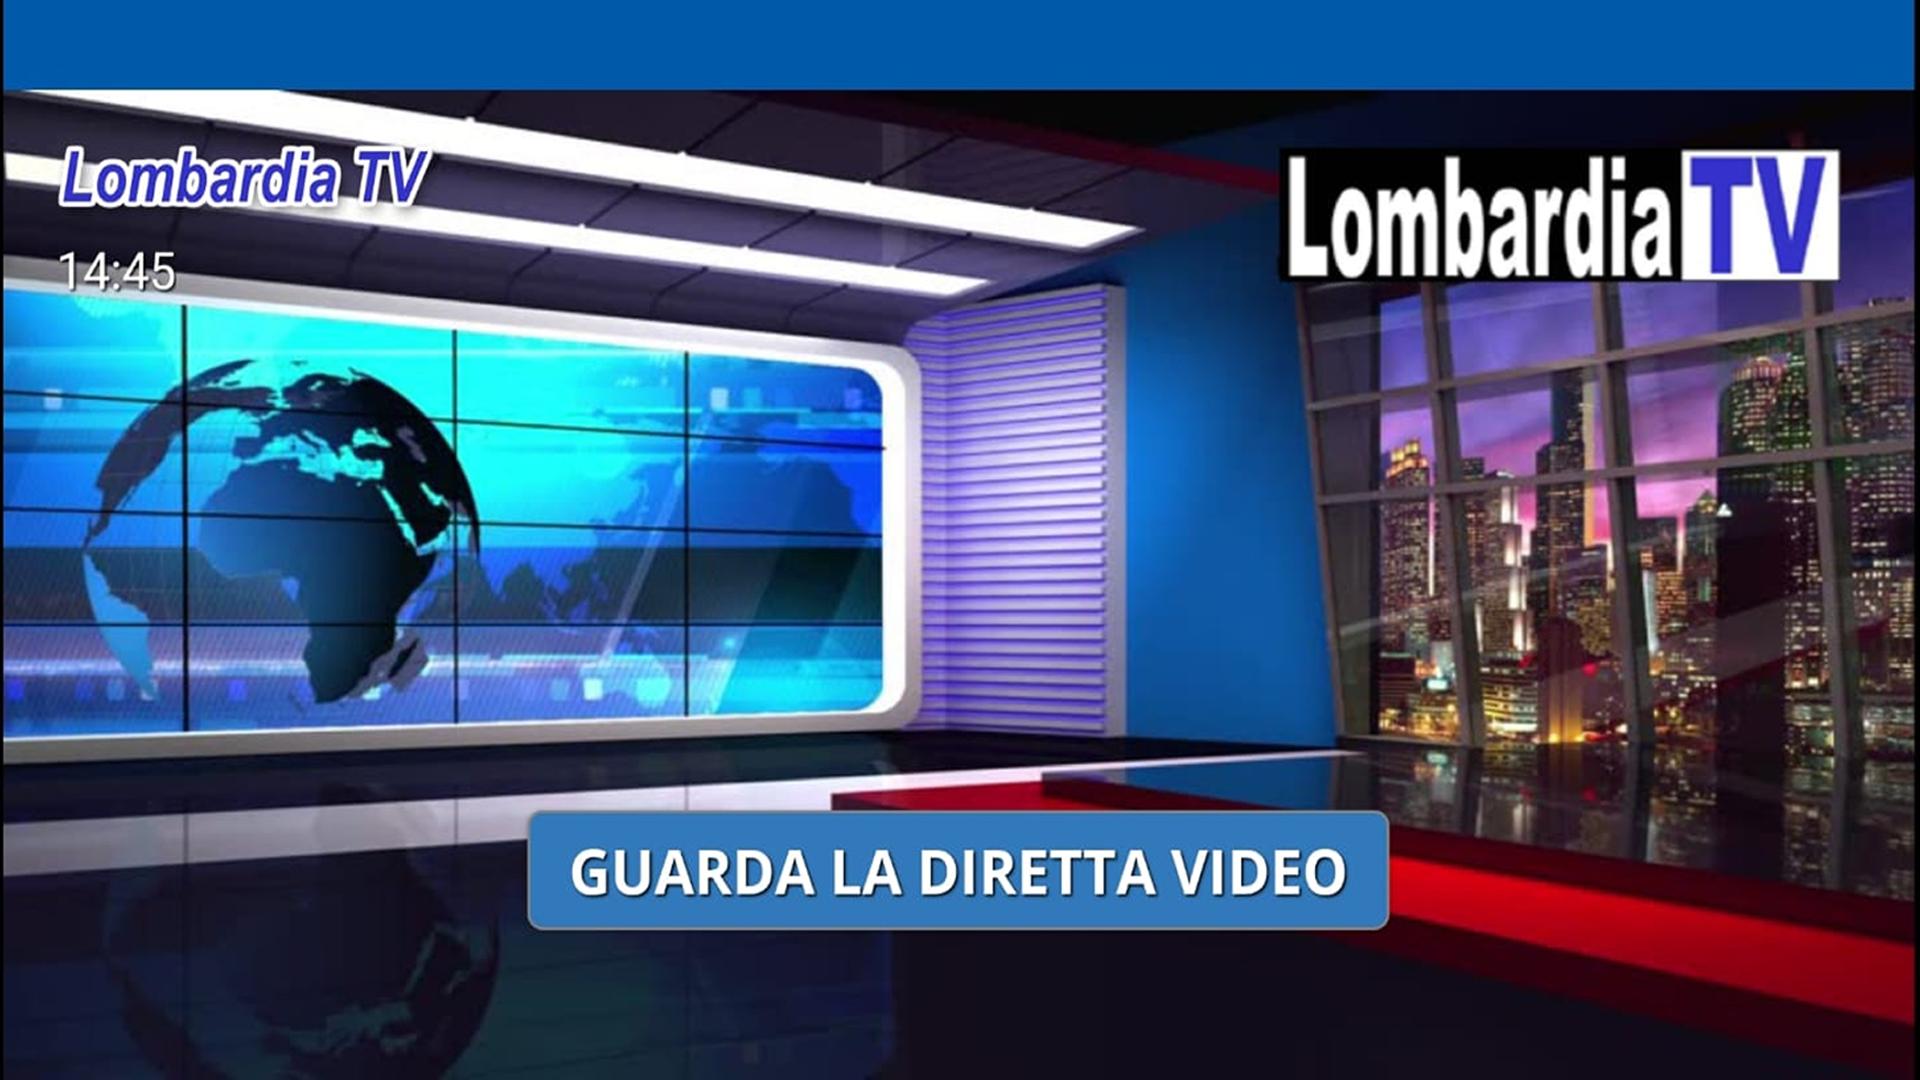 Lombardia TV: Amazon.es: Appstore para Android